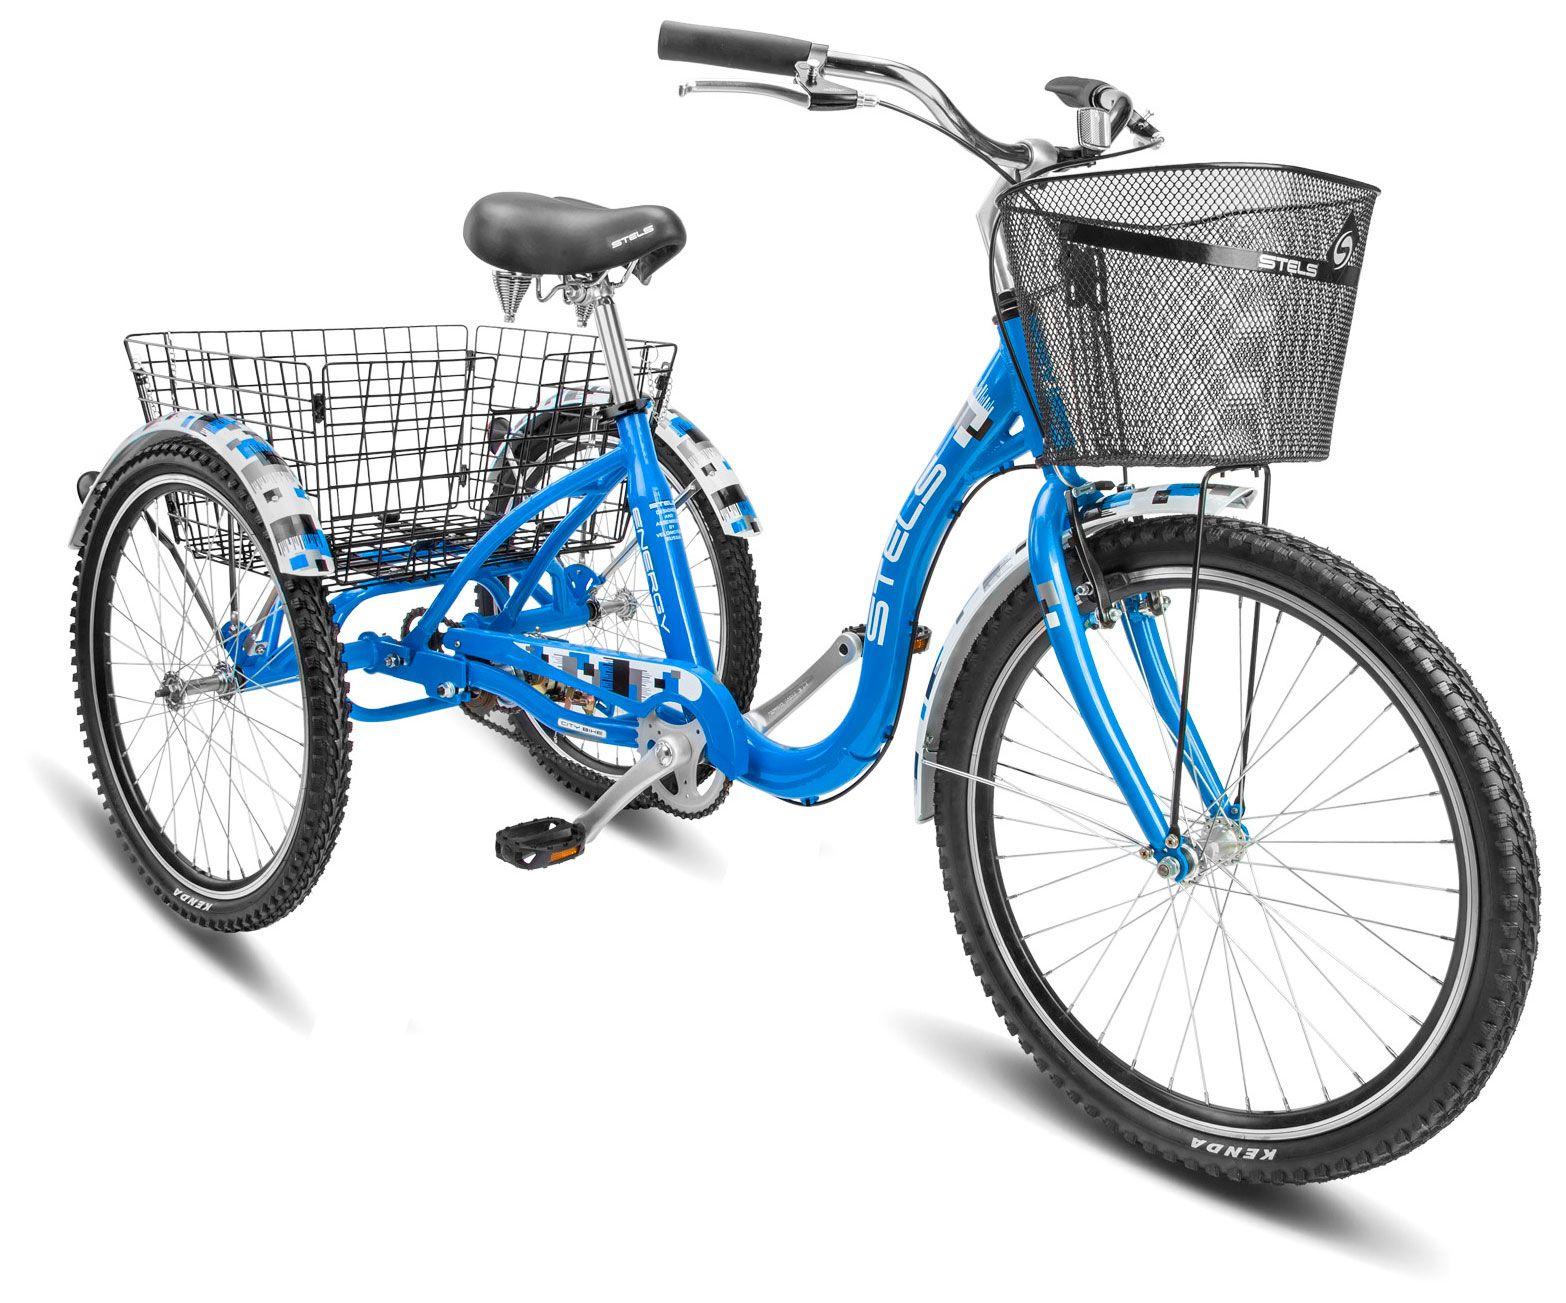 Велосипед Stels ENERGY IV V020 2018 велосипед stels powerkid 12 boy v020 2018